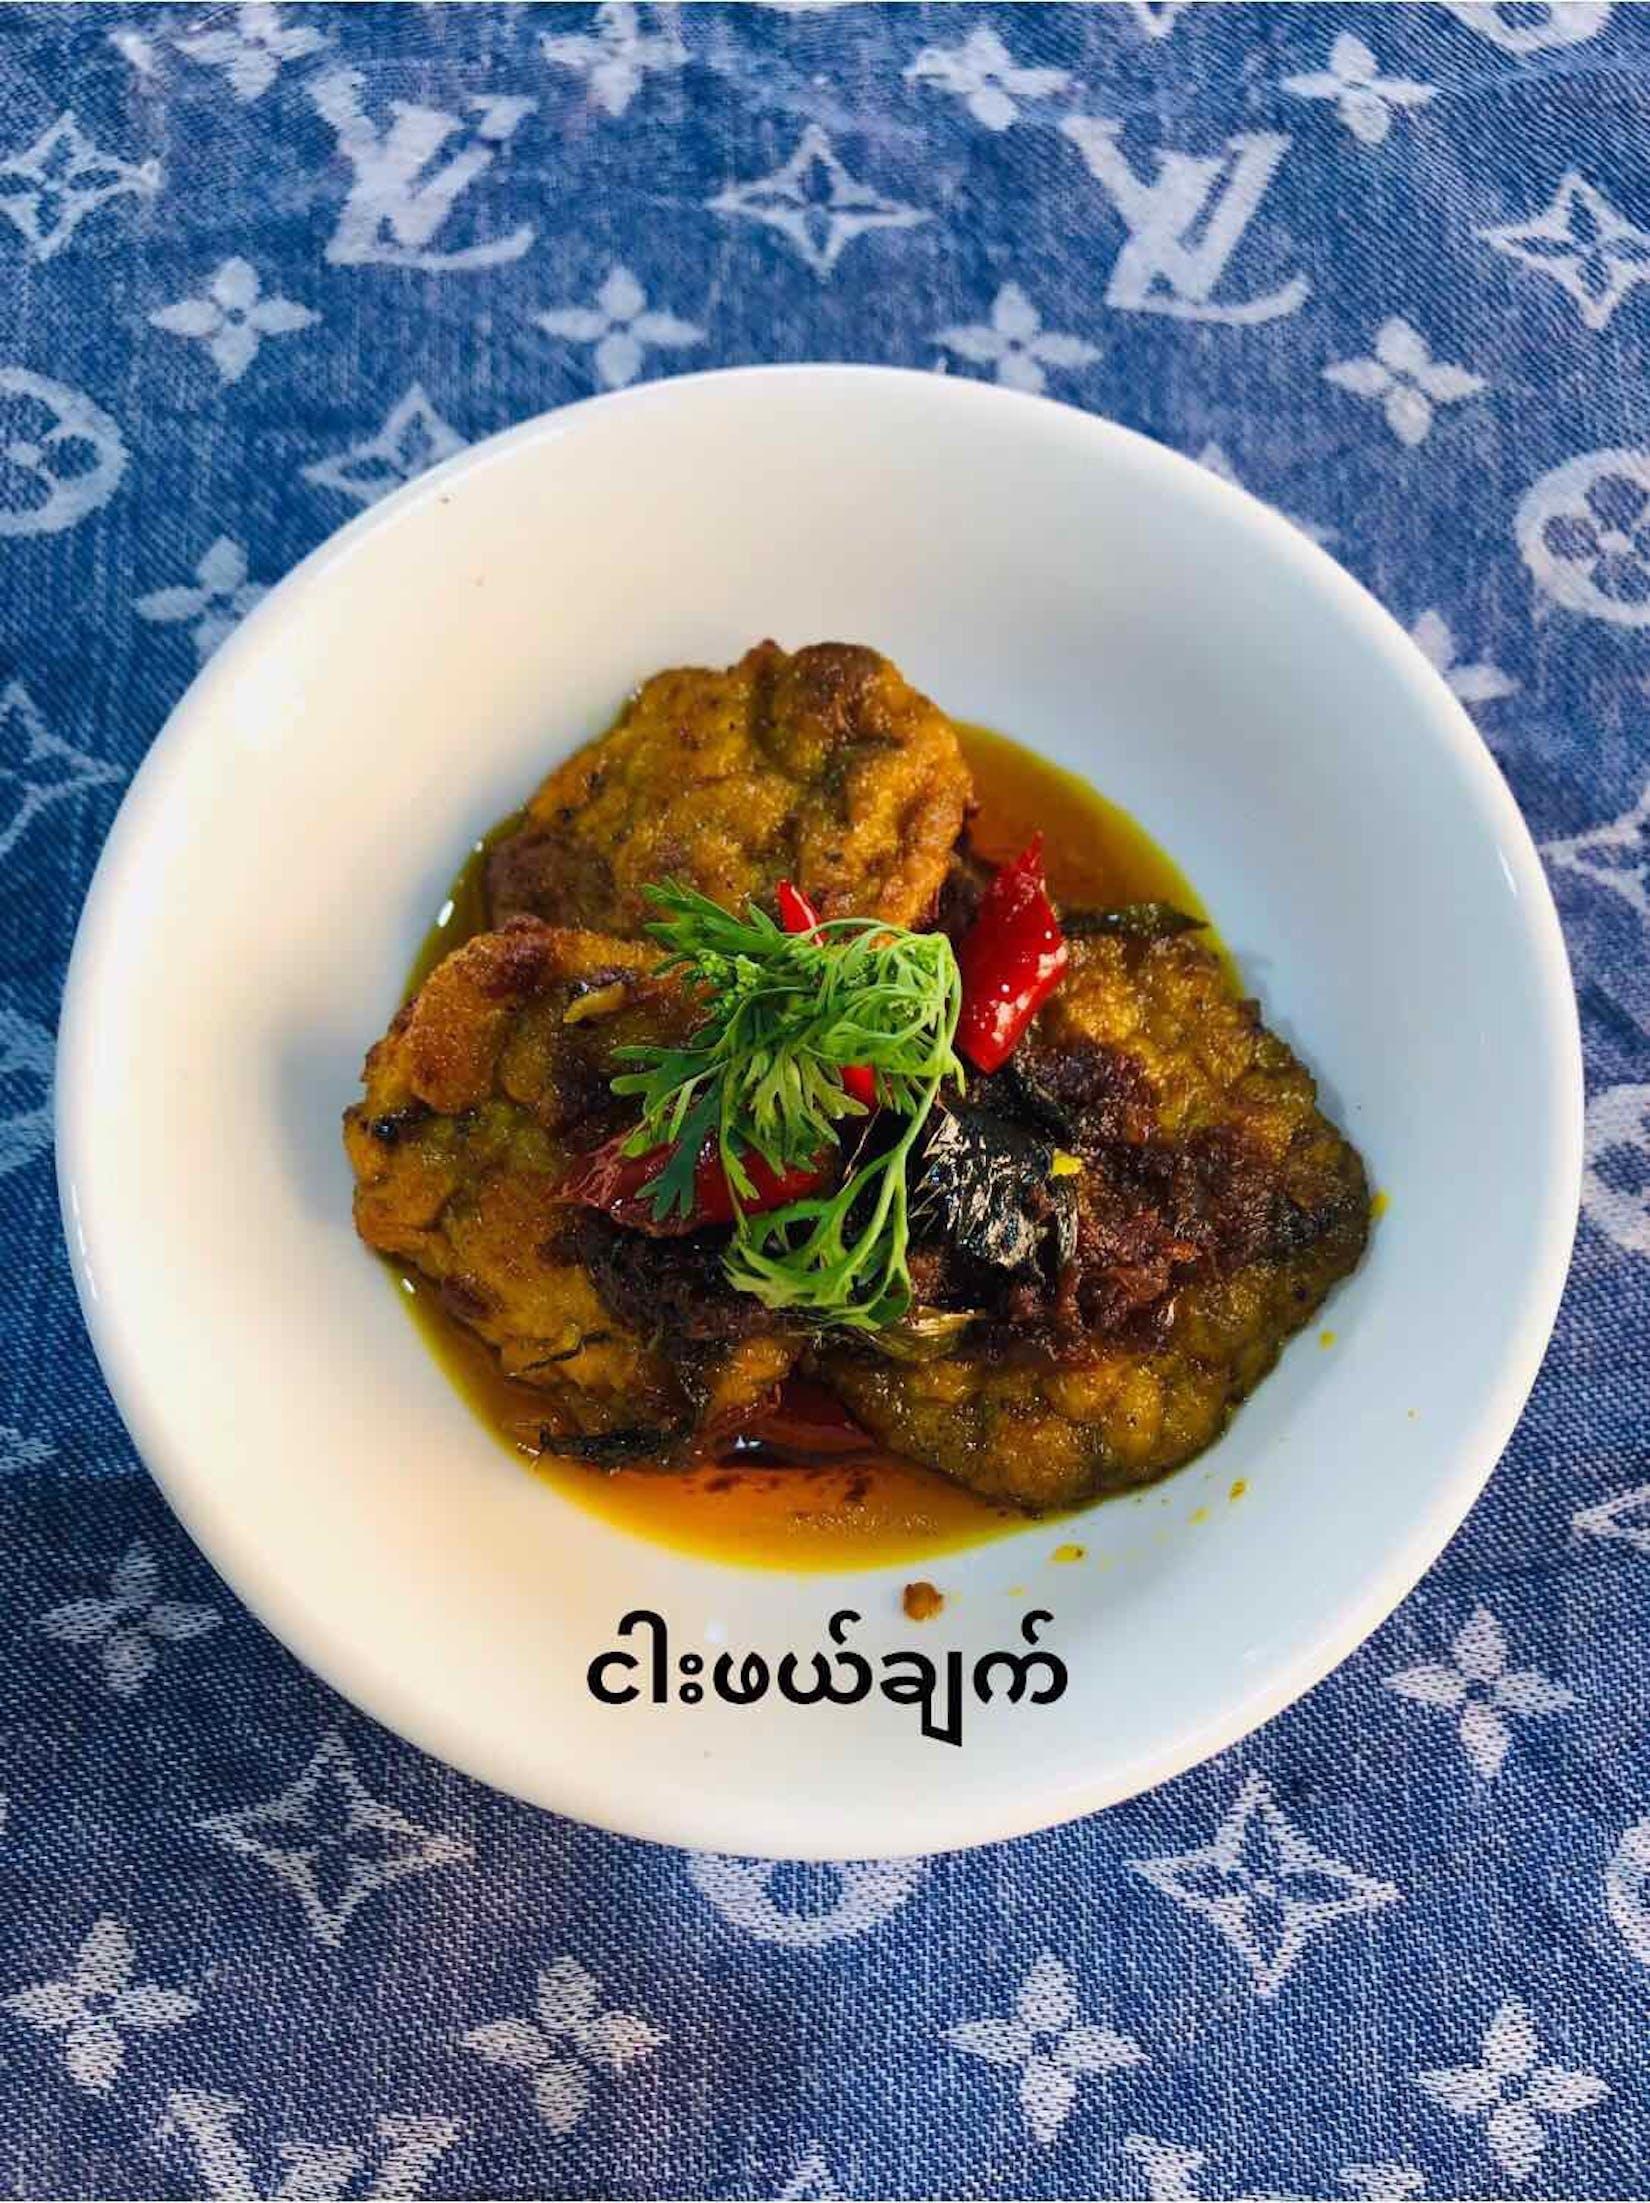 Phay Toke Myanmar Food Restaurant | yathar